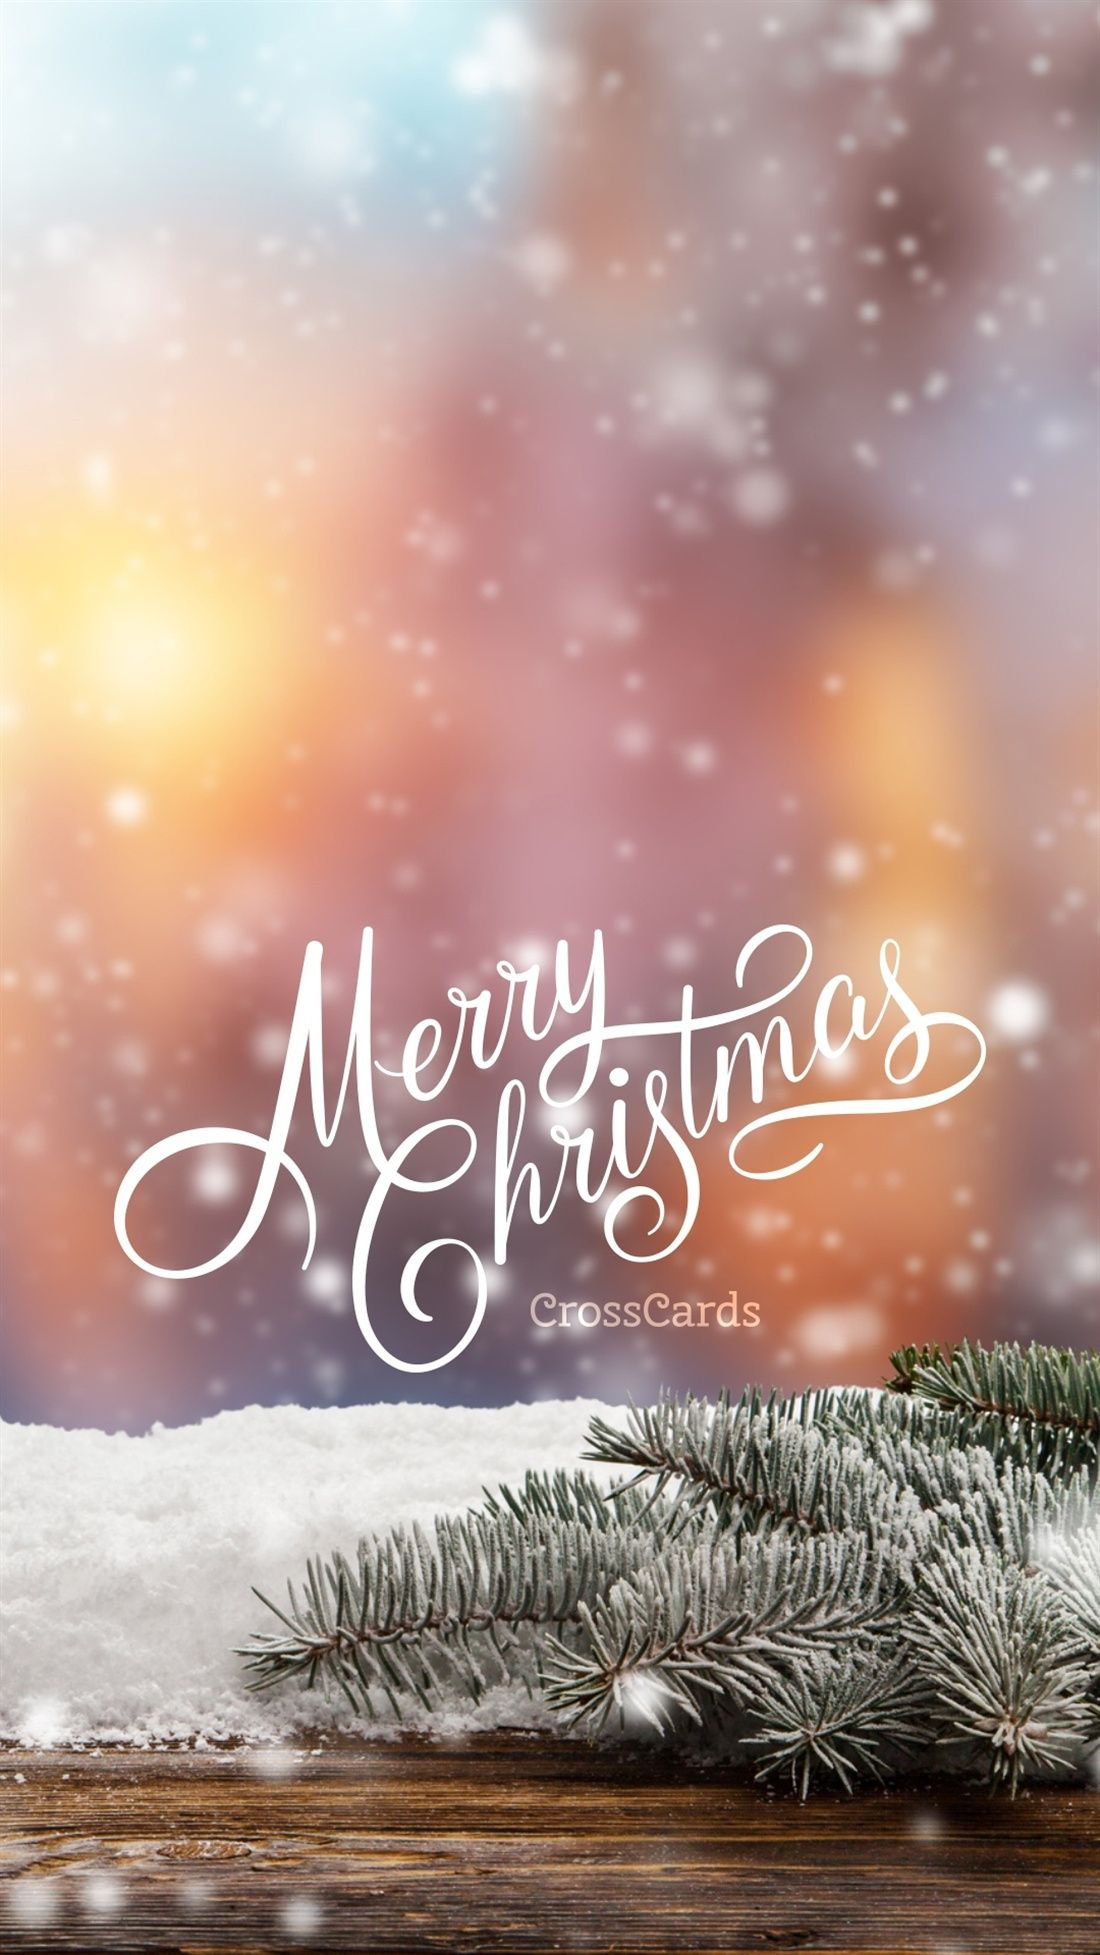 Merry Christmas to You Merry christmas wallpaper